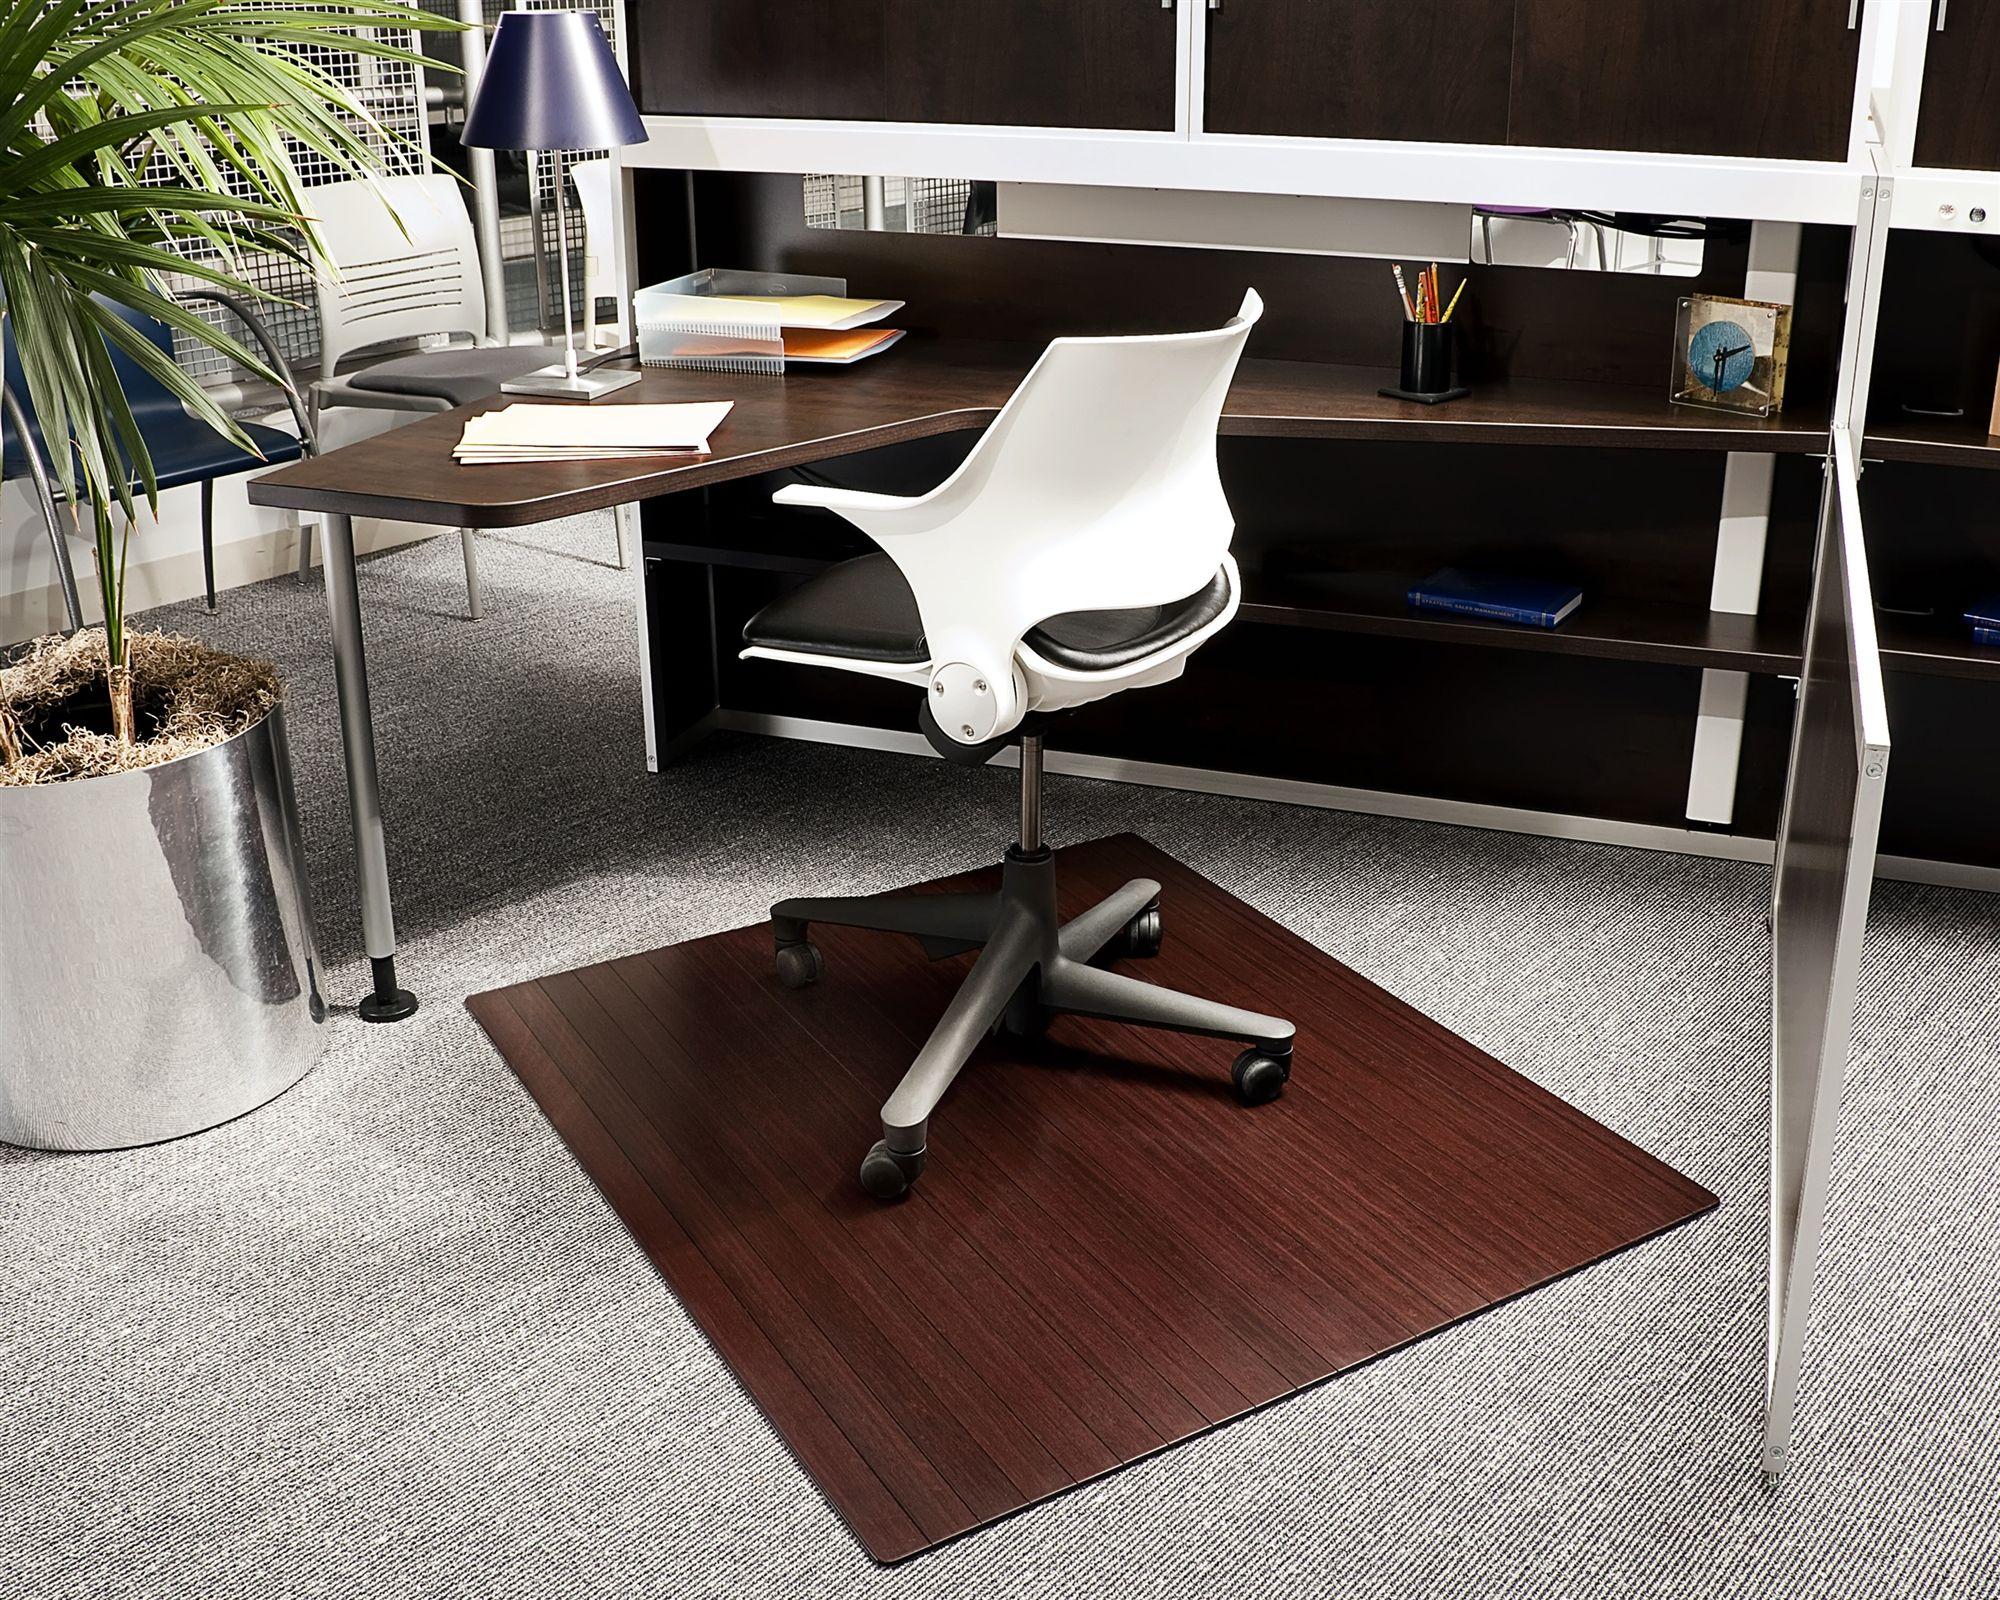 Corner desk chair mat luxury living room furniture sets